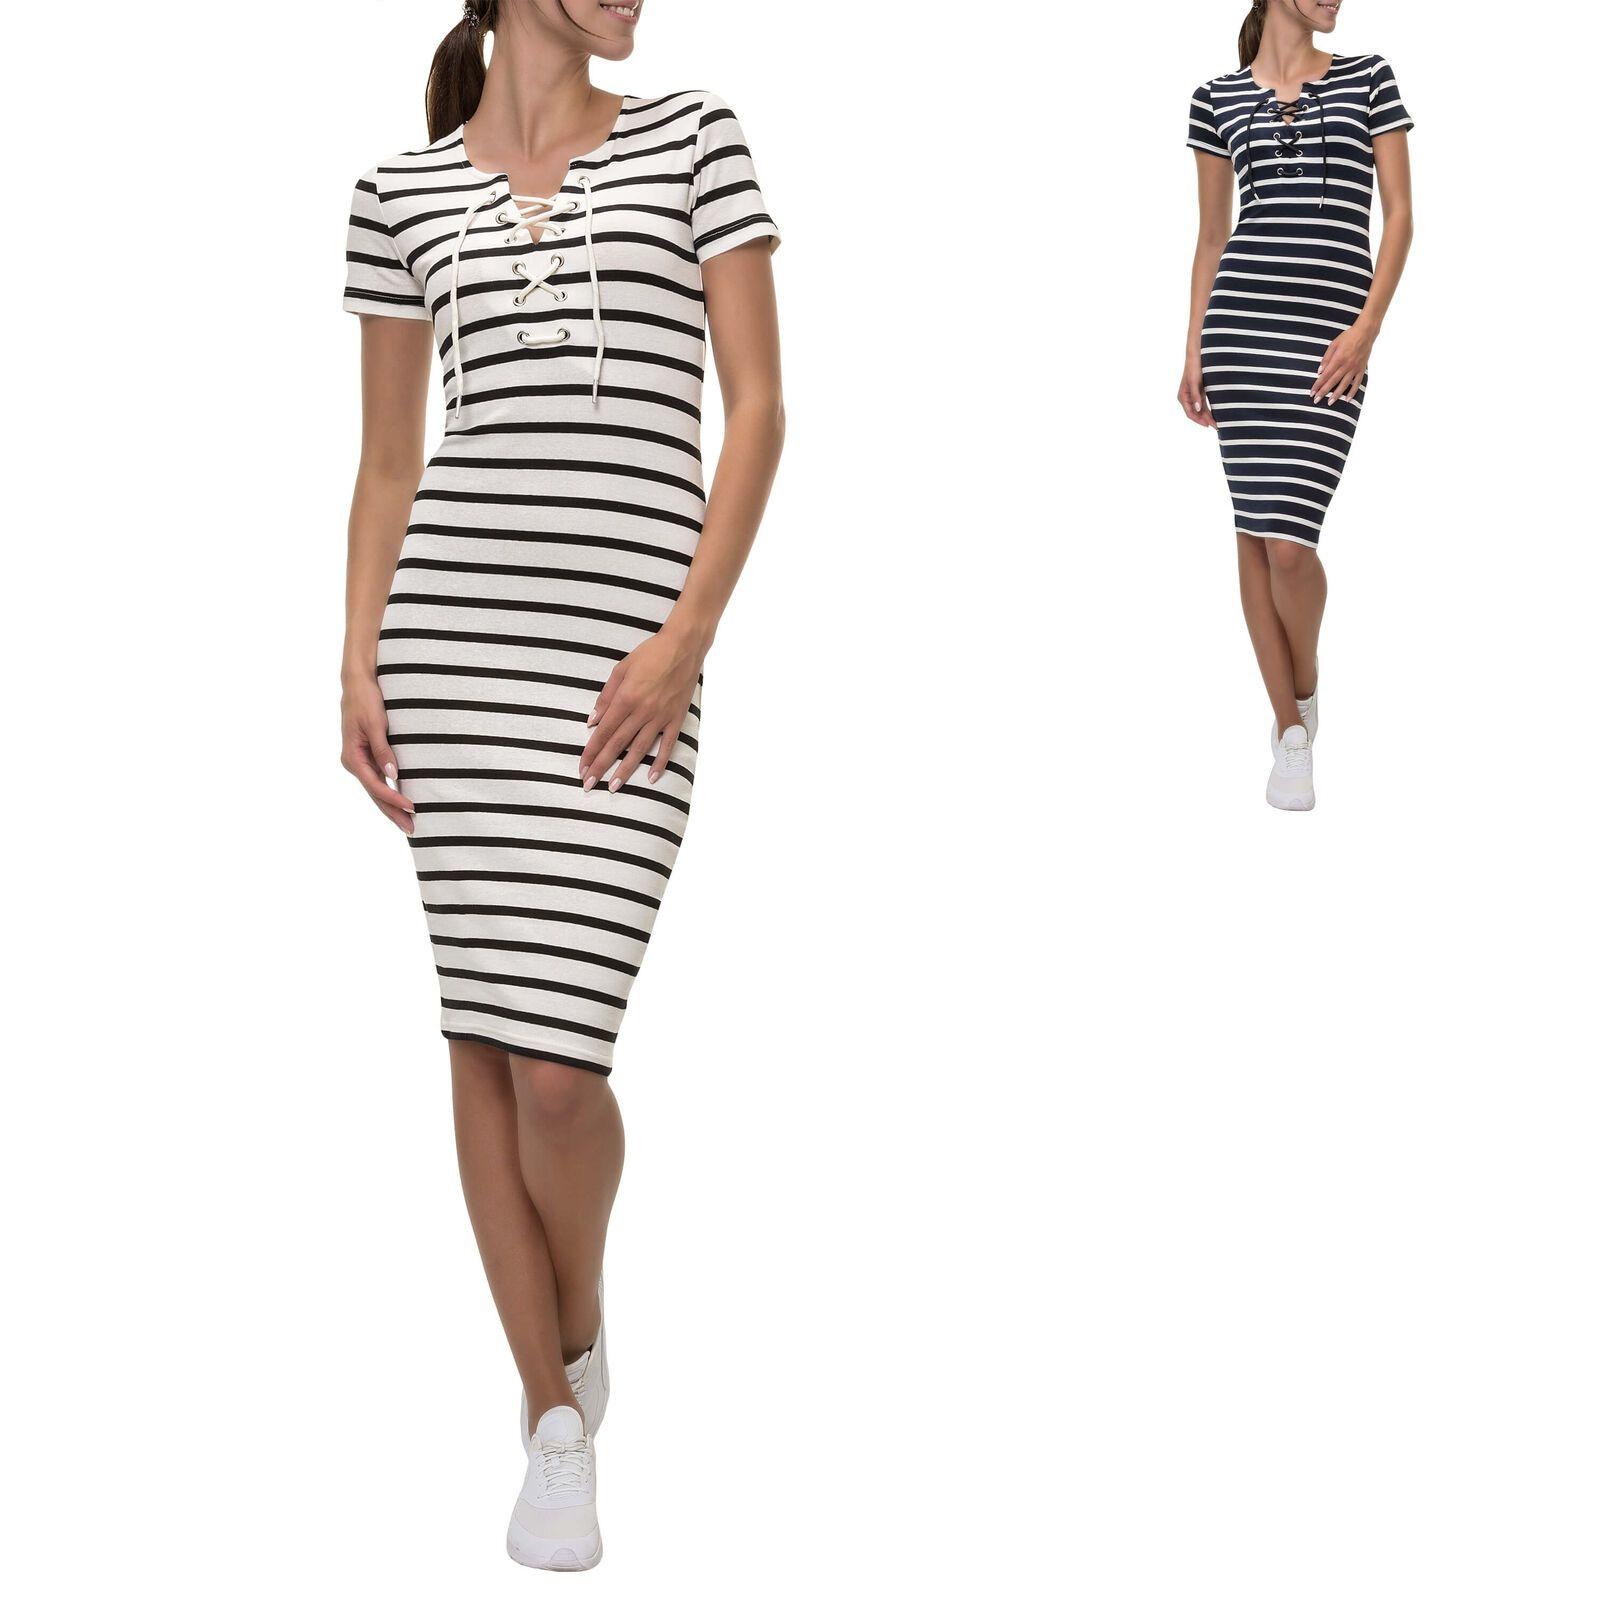 Hailys Damen Jerseykleid Etuikleid Streifen Printkleid Sommerkleid Kurzarm Shirt